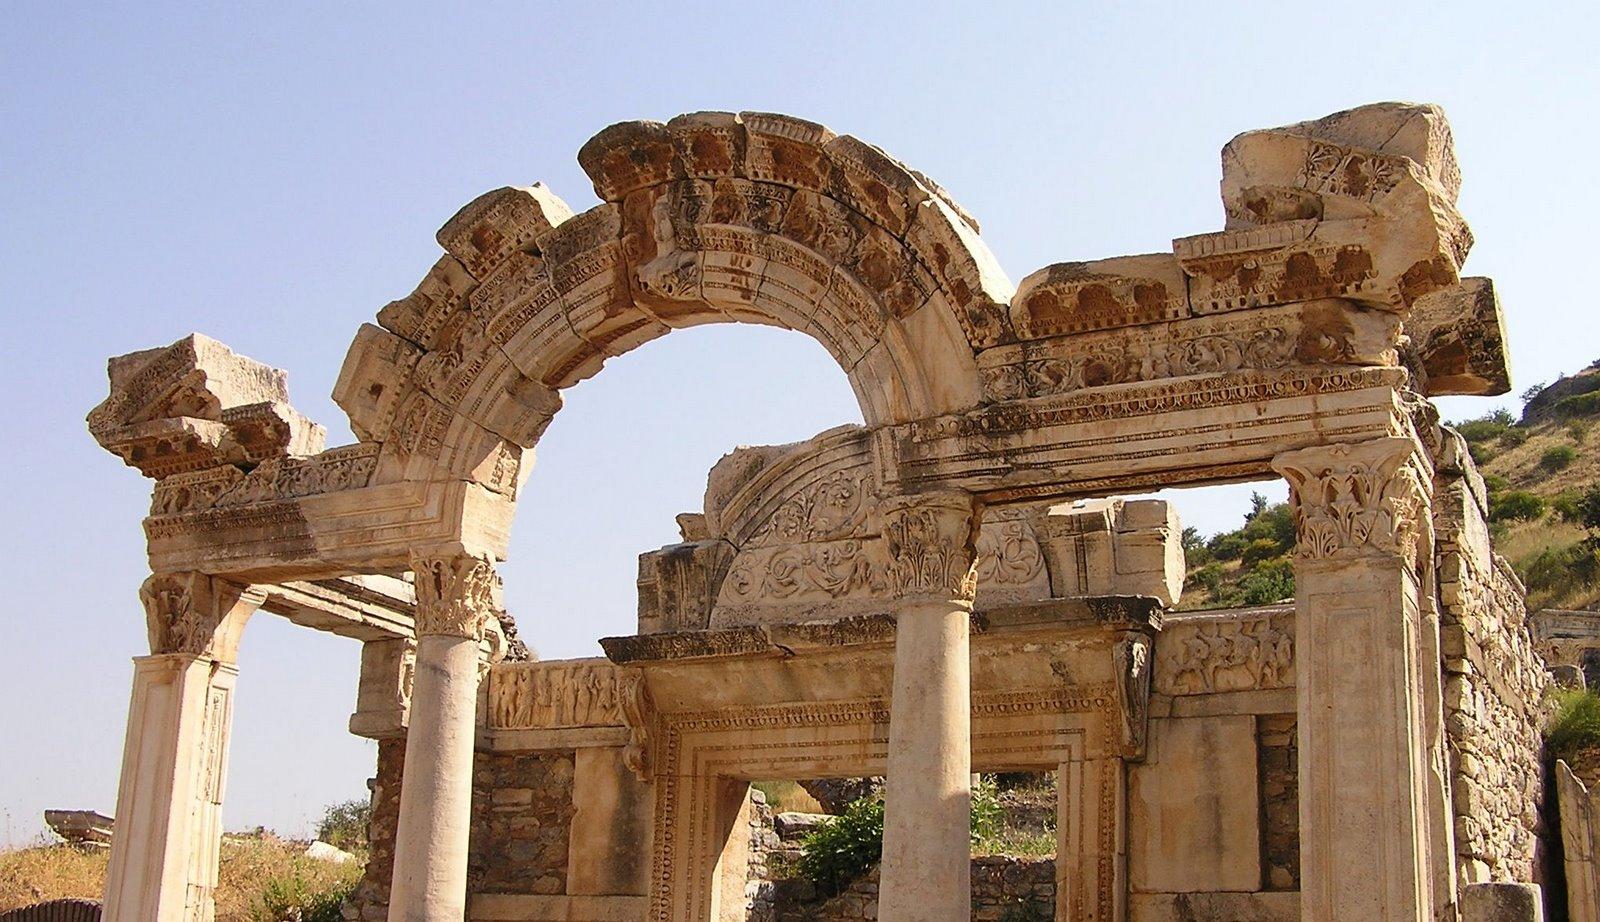 Hadrian's Arch, Ephesus, Turkey